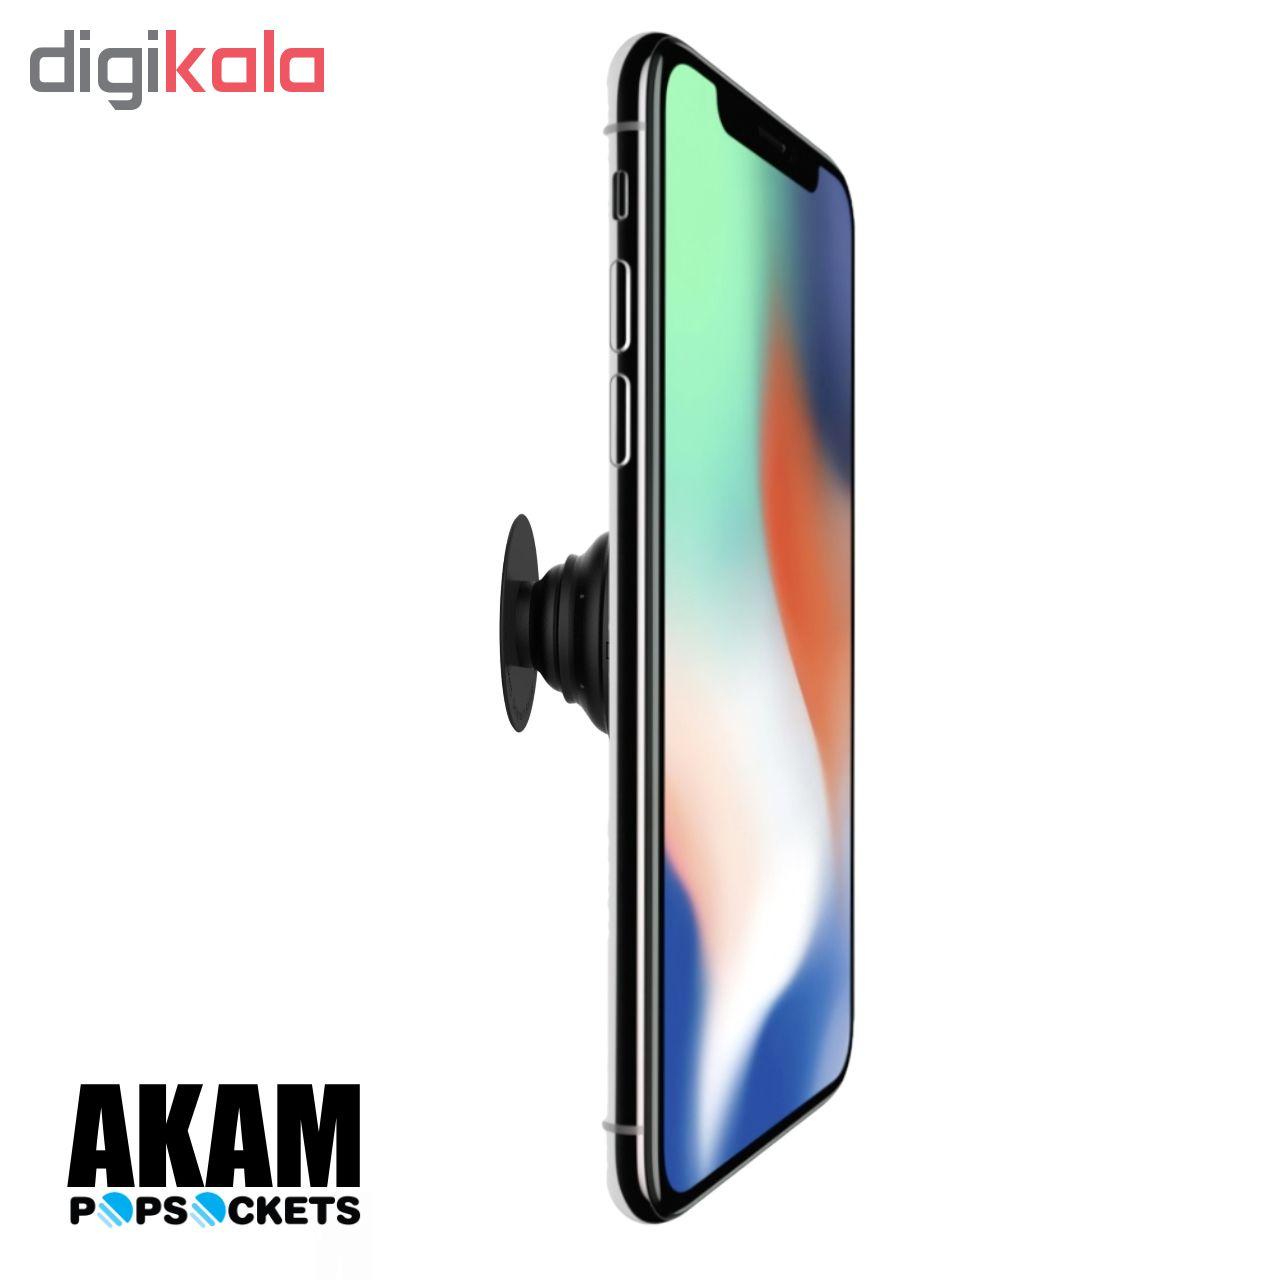 پایه نگهدارنده گوشی موبایل پاپ سوکت آکام مدل APS0191 main 1 10